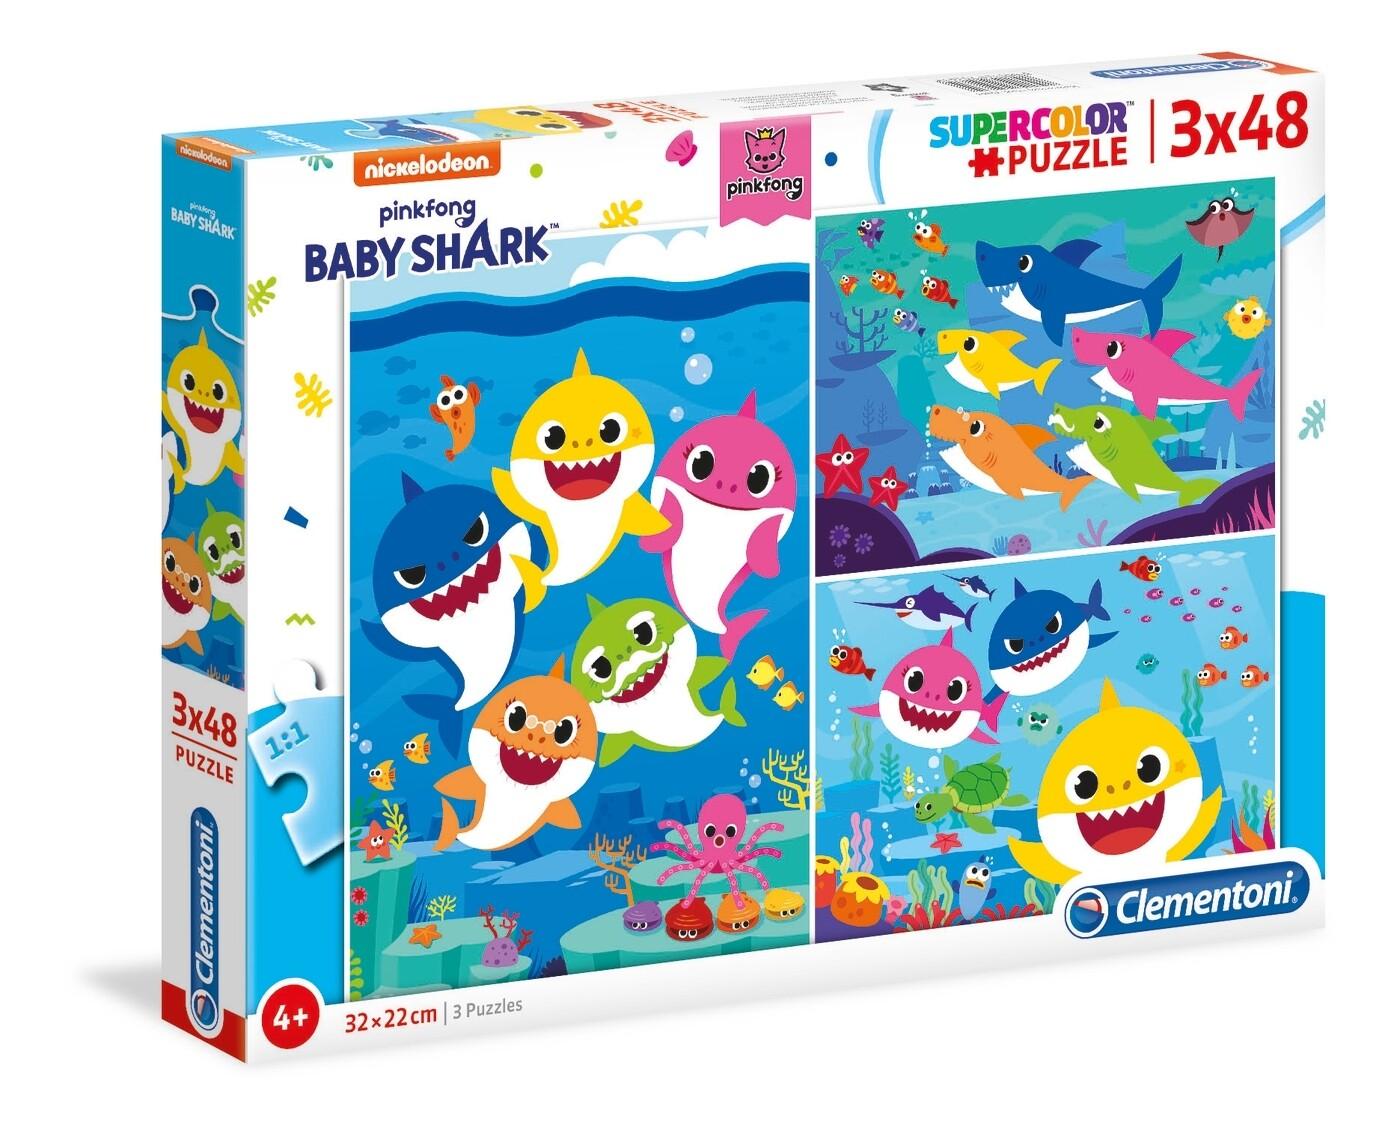 PUZZLE Baby Shark - 3x48 pcs - CLEMENTONI